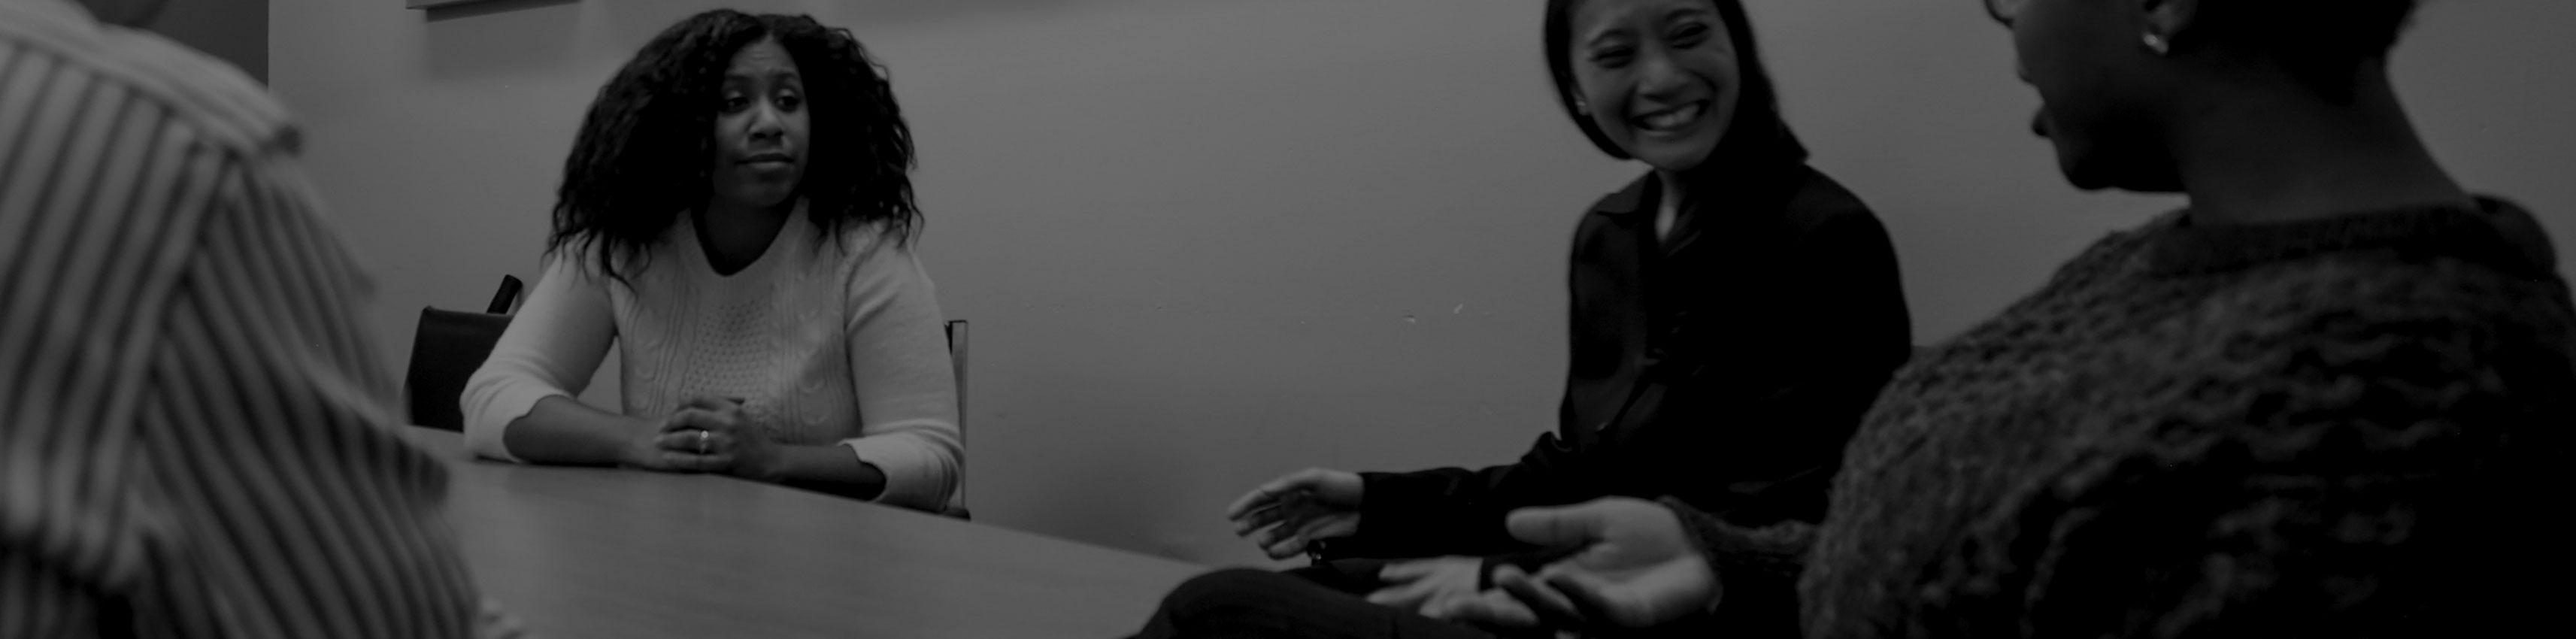 Mediation - New York Peace Institute